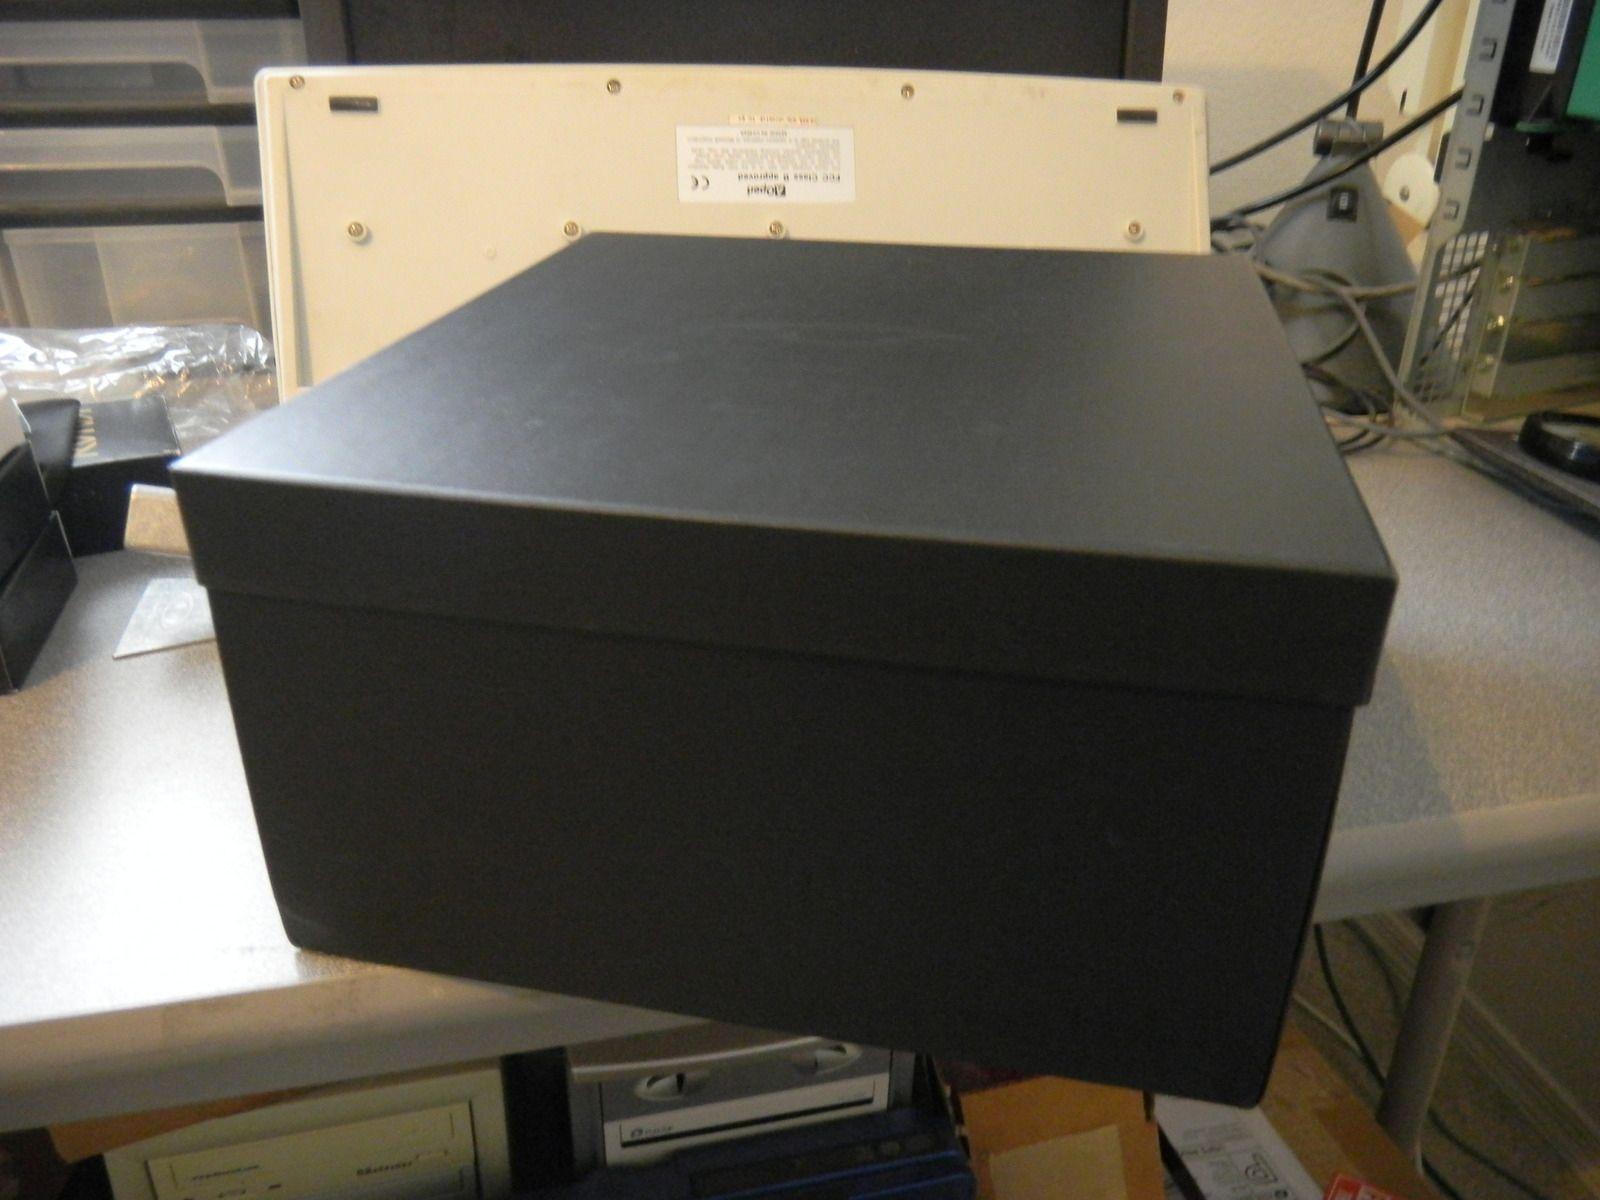 New In Box Complete C SIX - DSCN1624.JPG